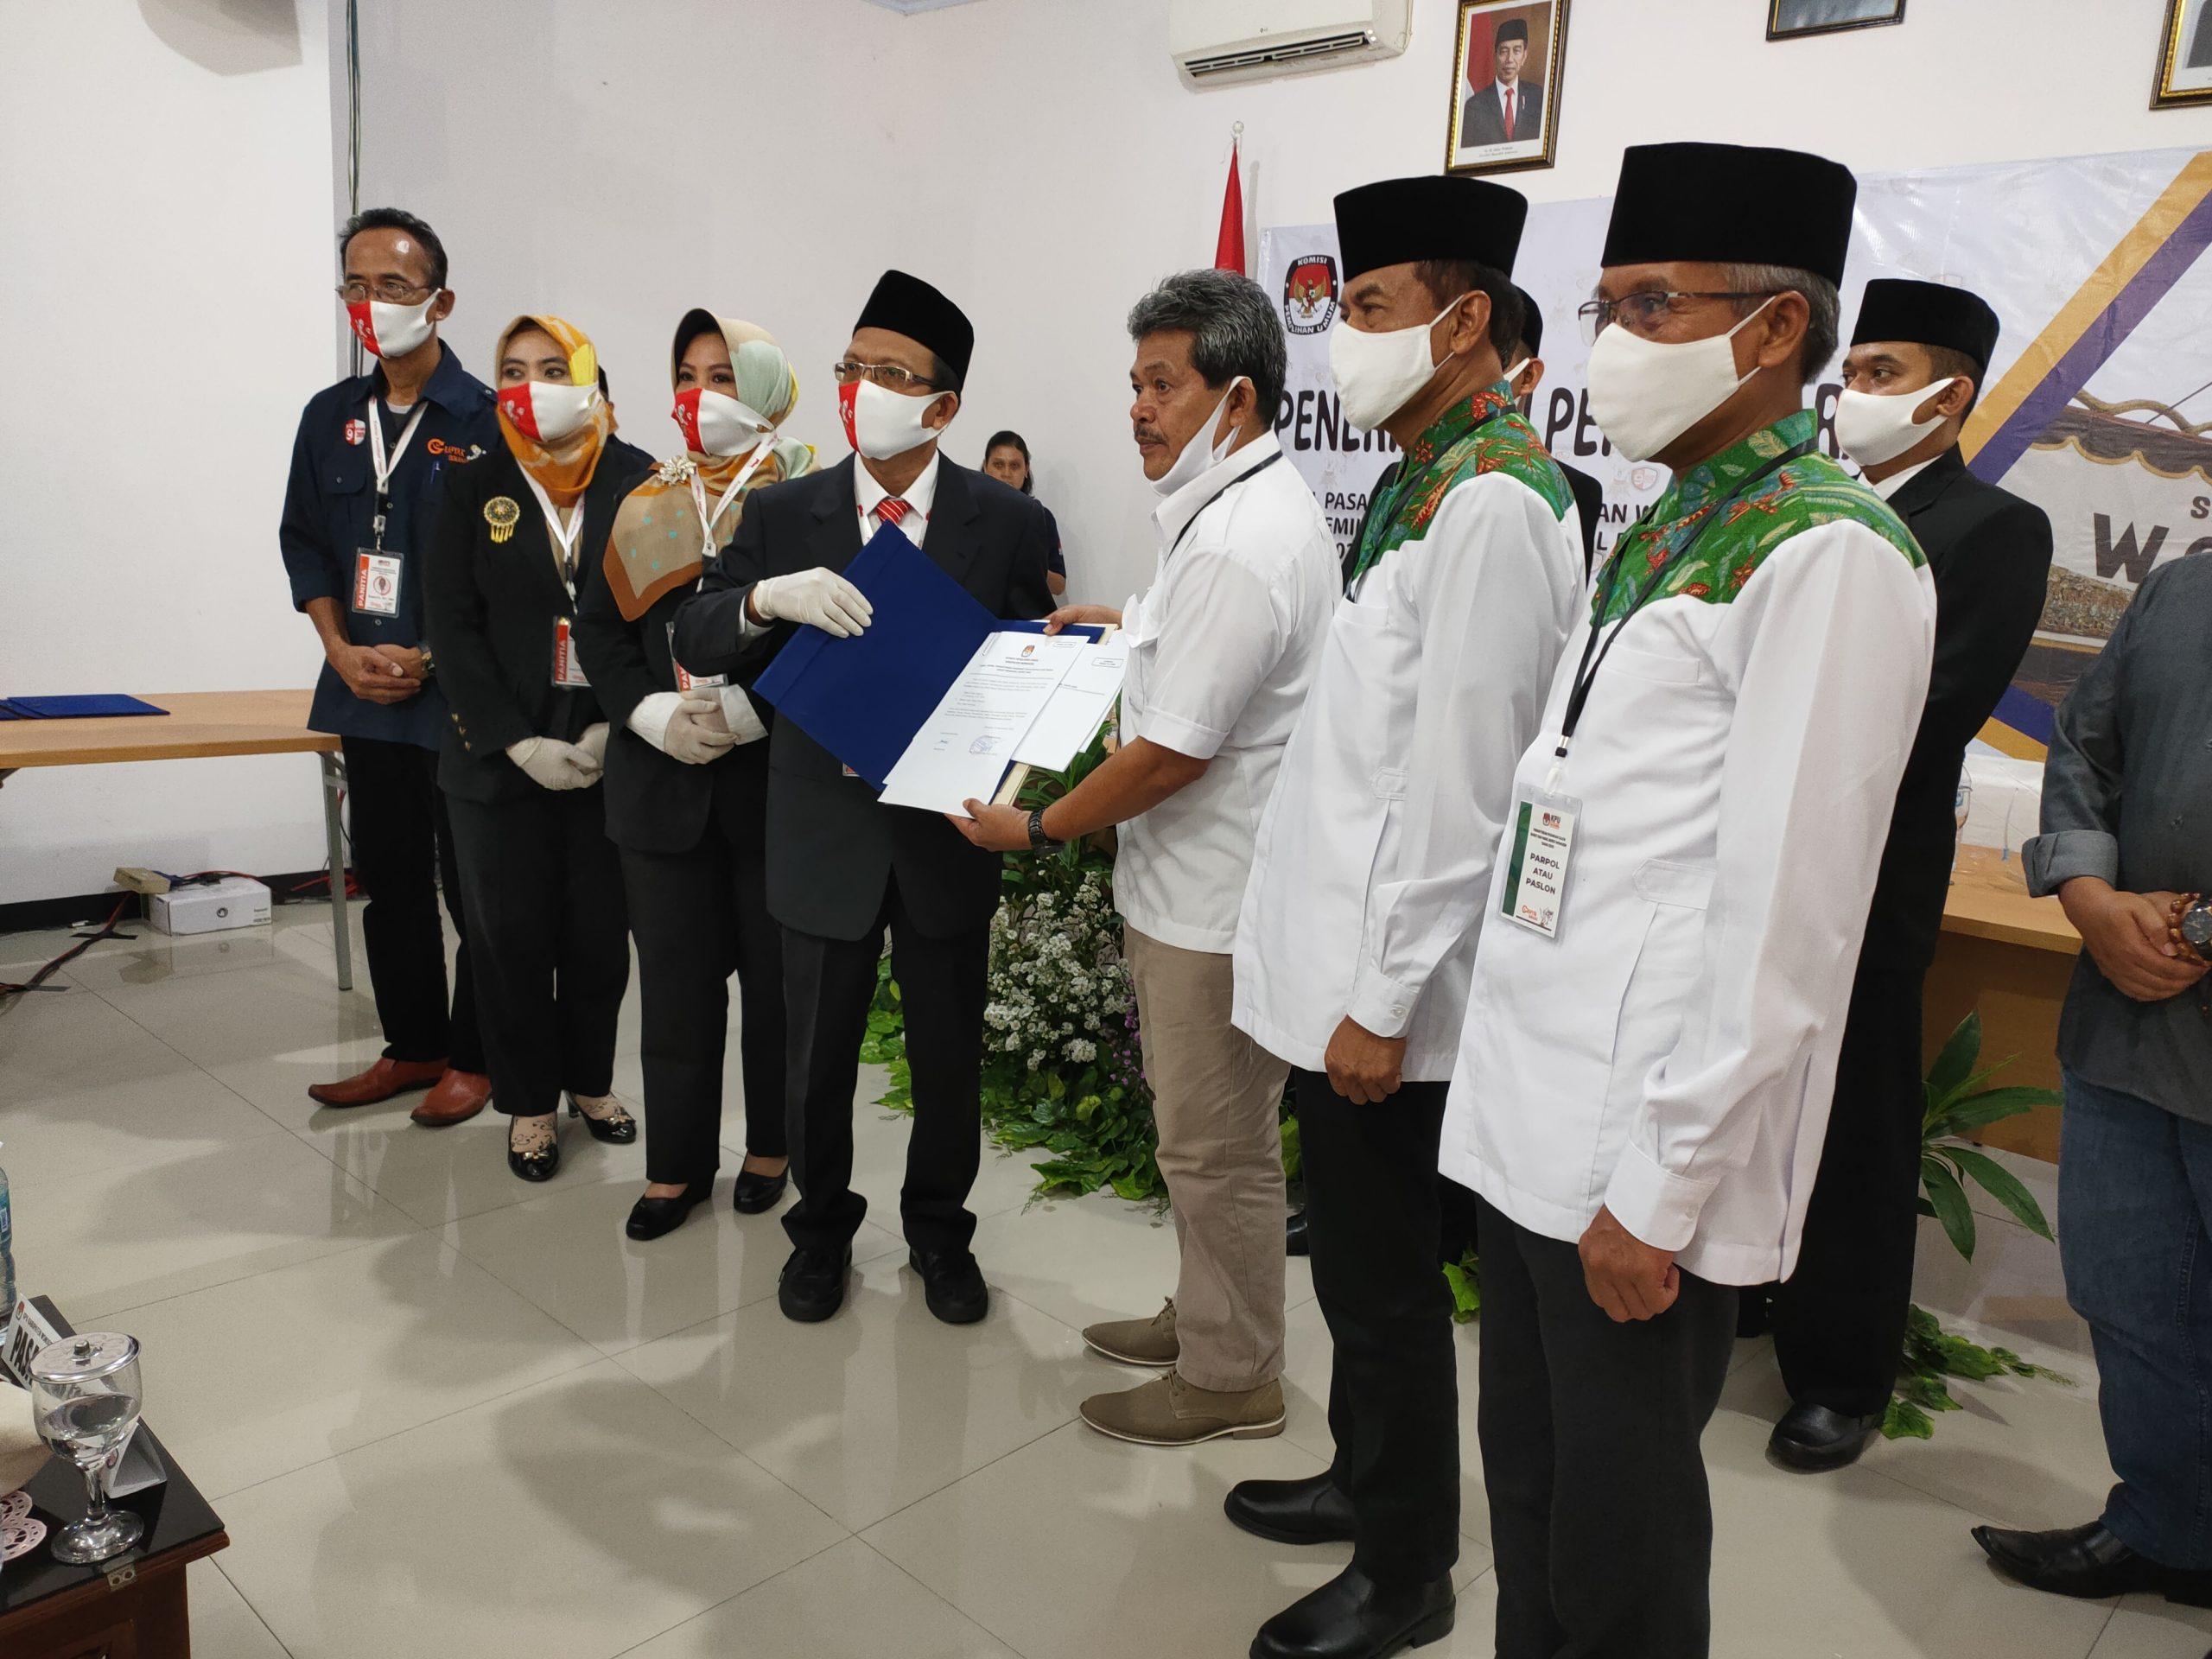 Photo of Lawan Petahana, Harjo Targetkan Menang 60% Suara Pilkada Wonogiri